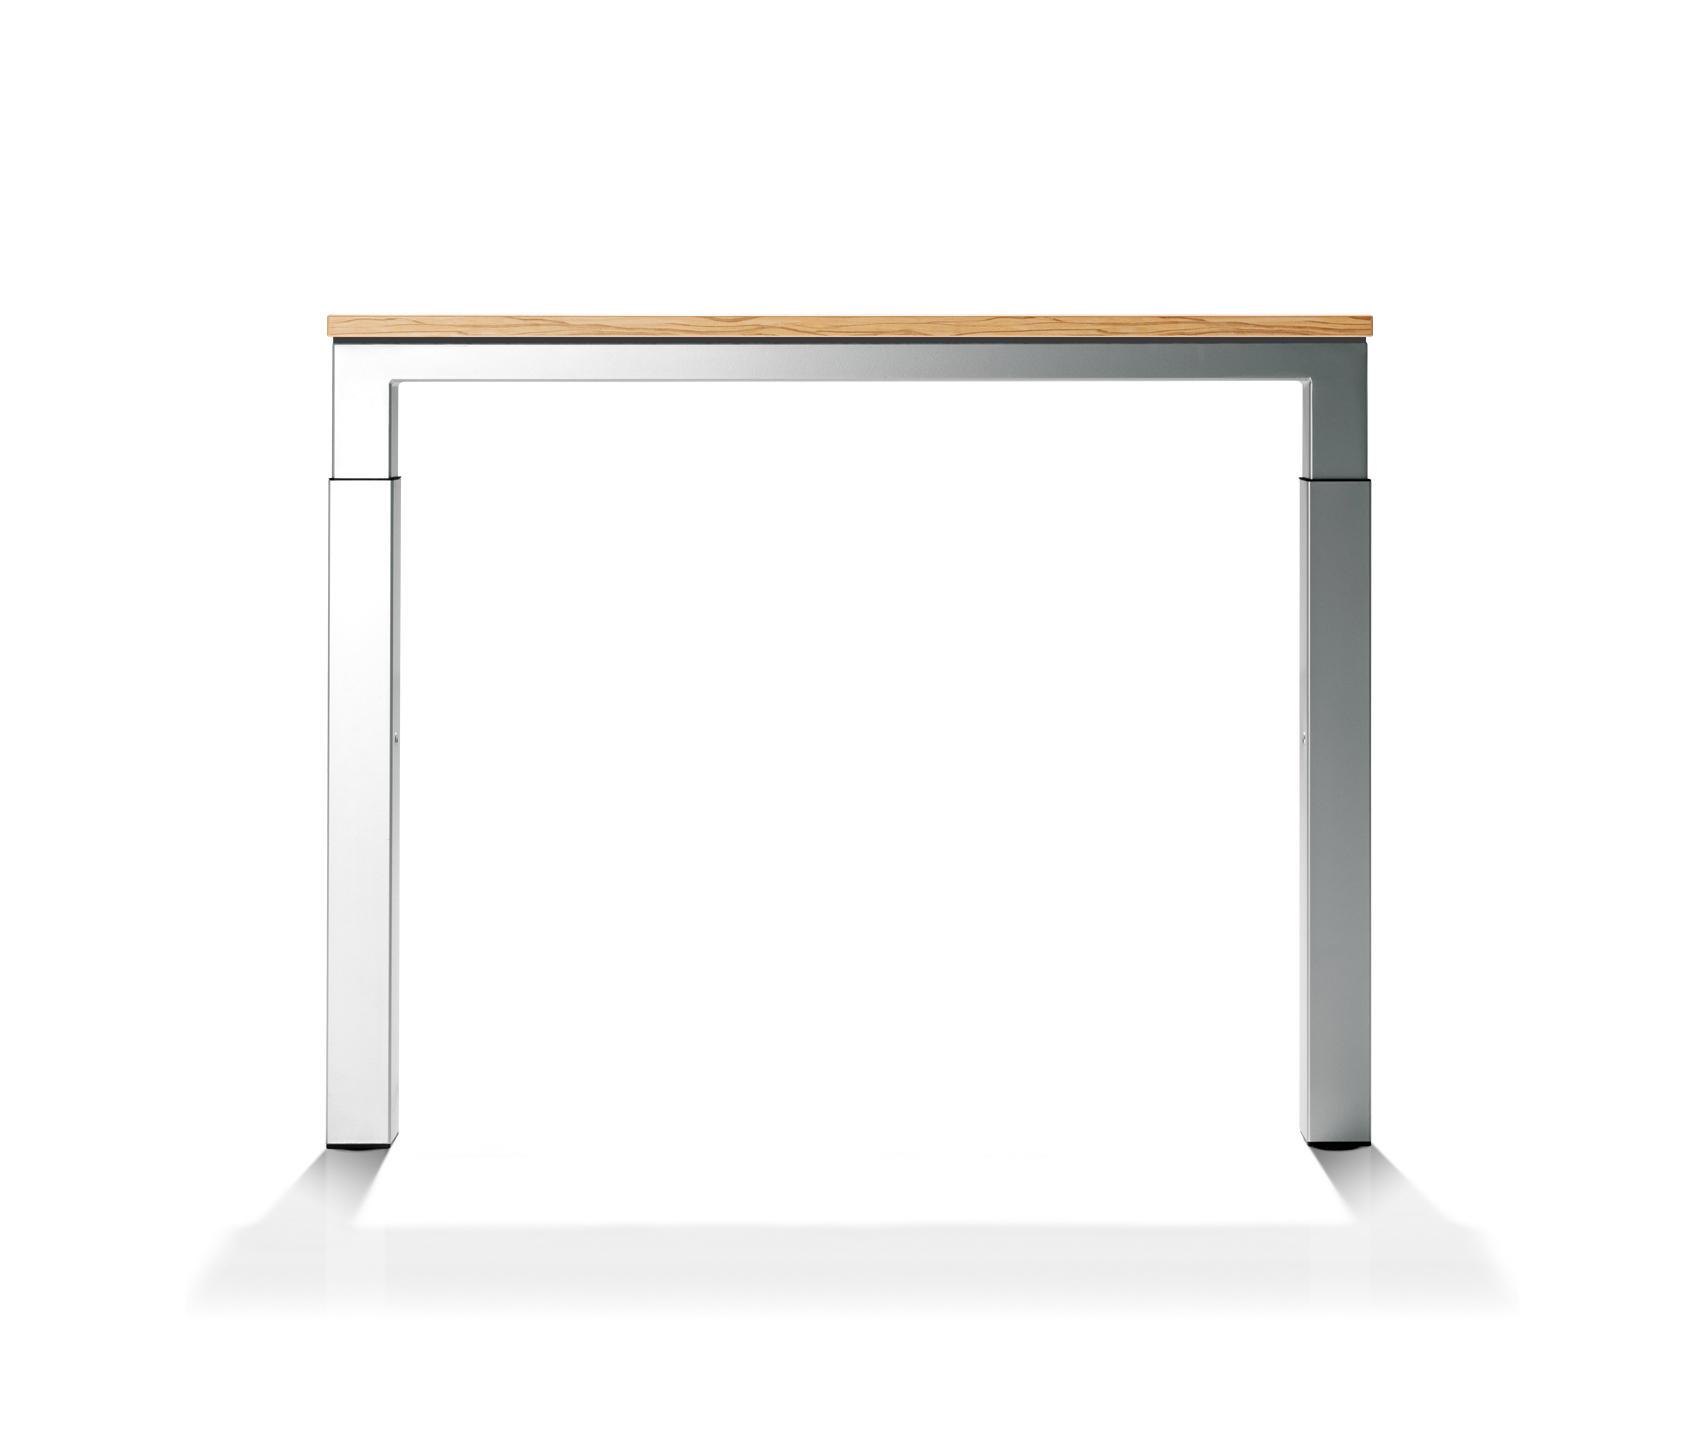 WINEA ECO - Einzeltische von WINI Büromöbel | Architonic